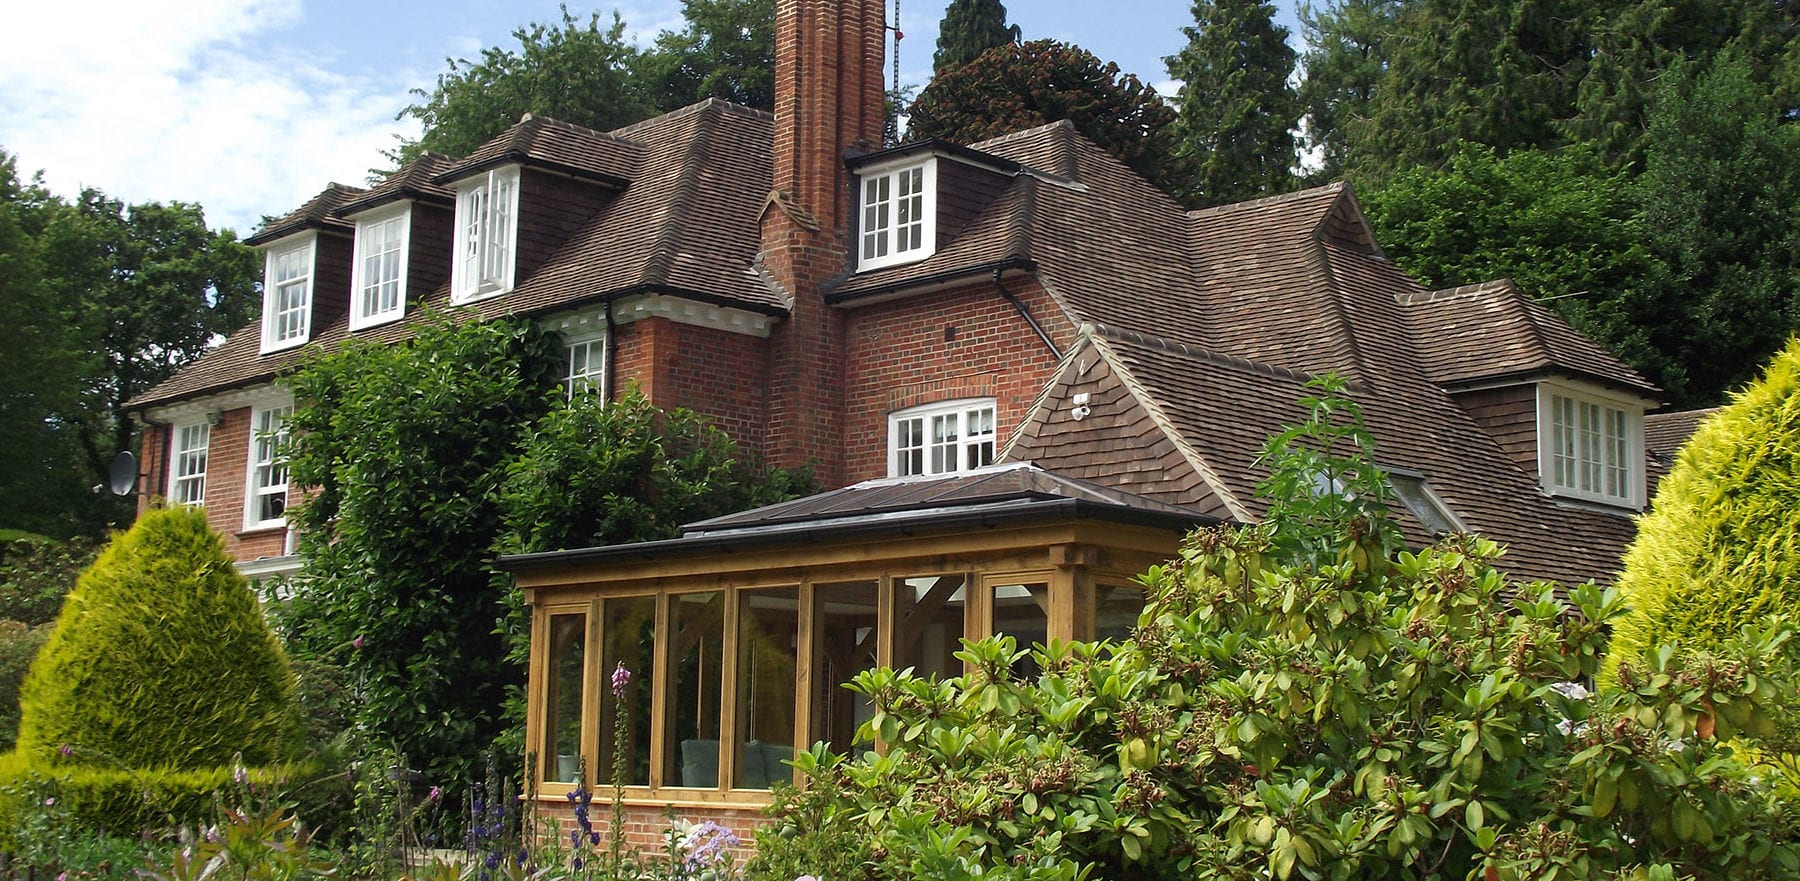 Lifestiles - Handmade Restoration Clay Roof Tiles - Farnham, England 7